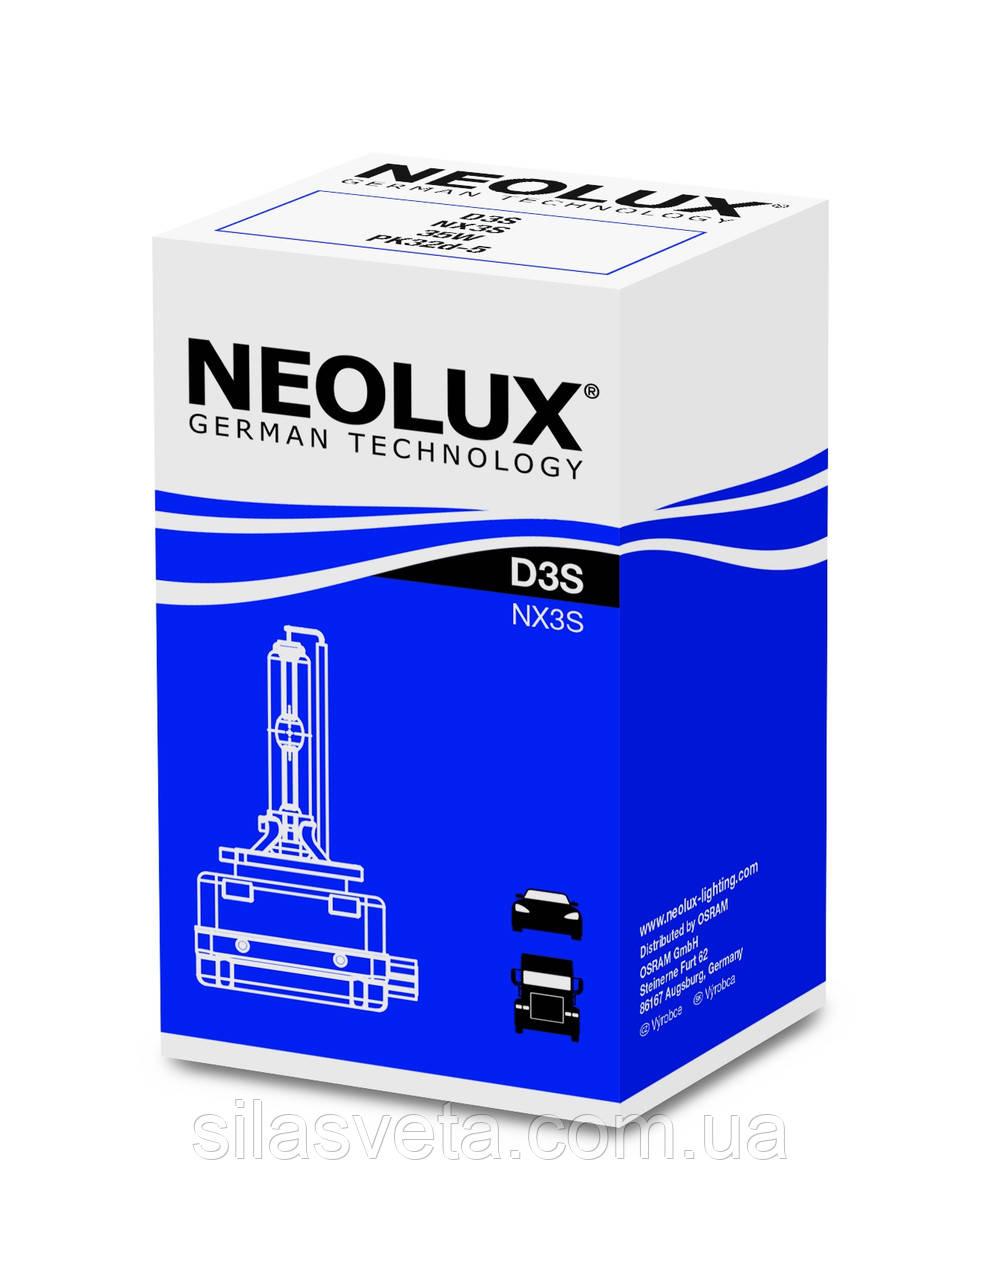 "Оригинальная штатная ксеноновая газоразрядная лампа ""Neolux"" D3S (4300K)"